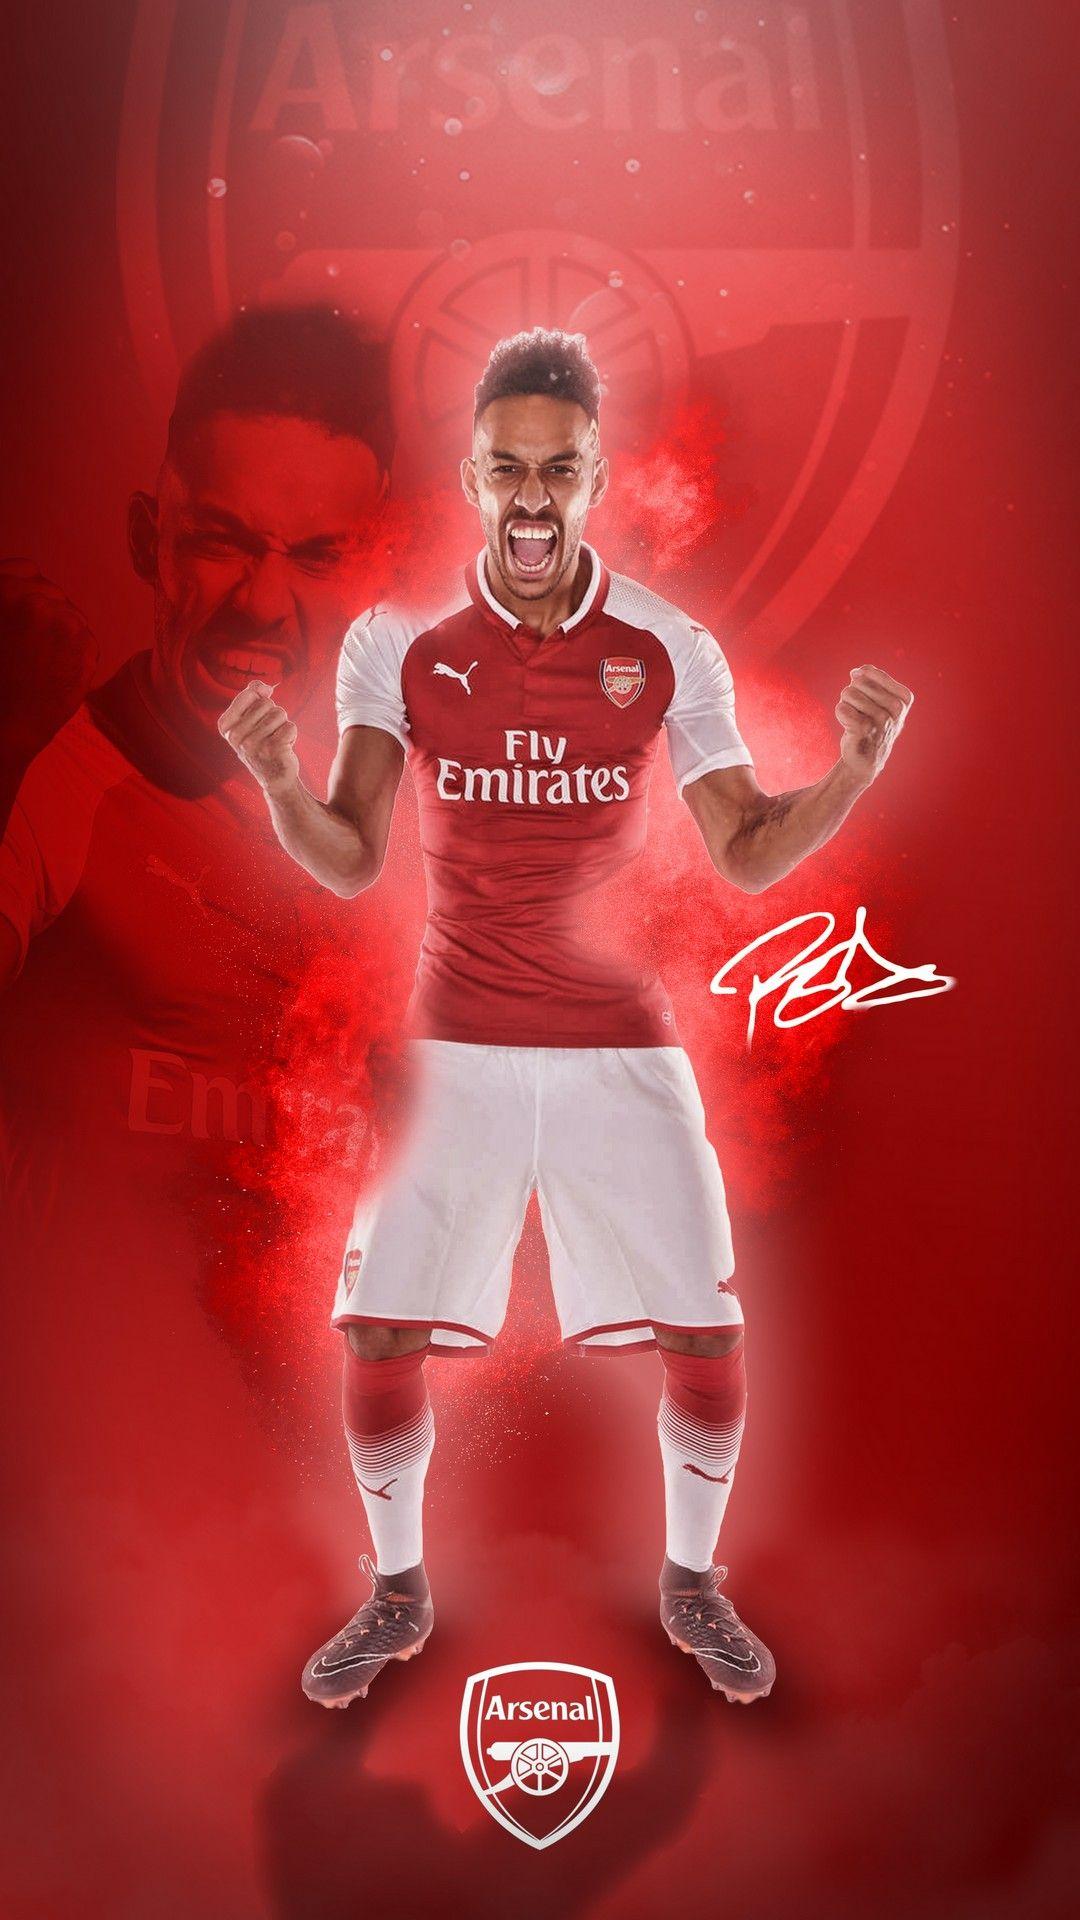 Aubameyang Arsenal Players Android Wallpaper Best Android Wallpapers Arsenal Wallpapers Arsenal Players Aubameyang Arsenal